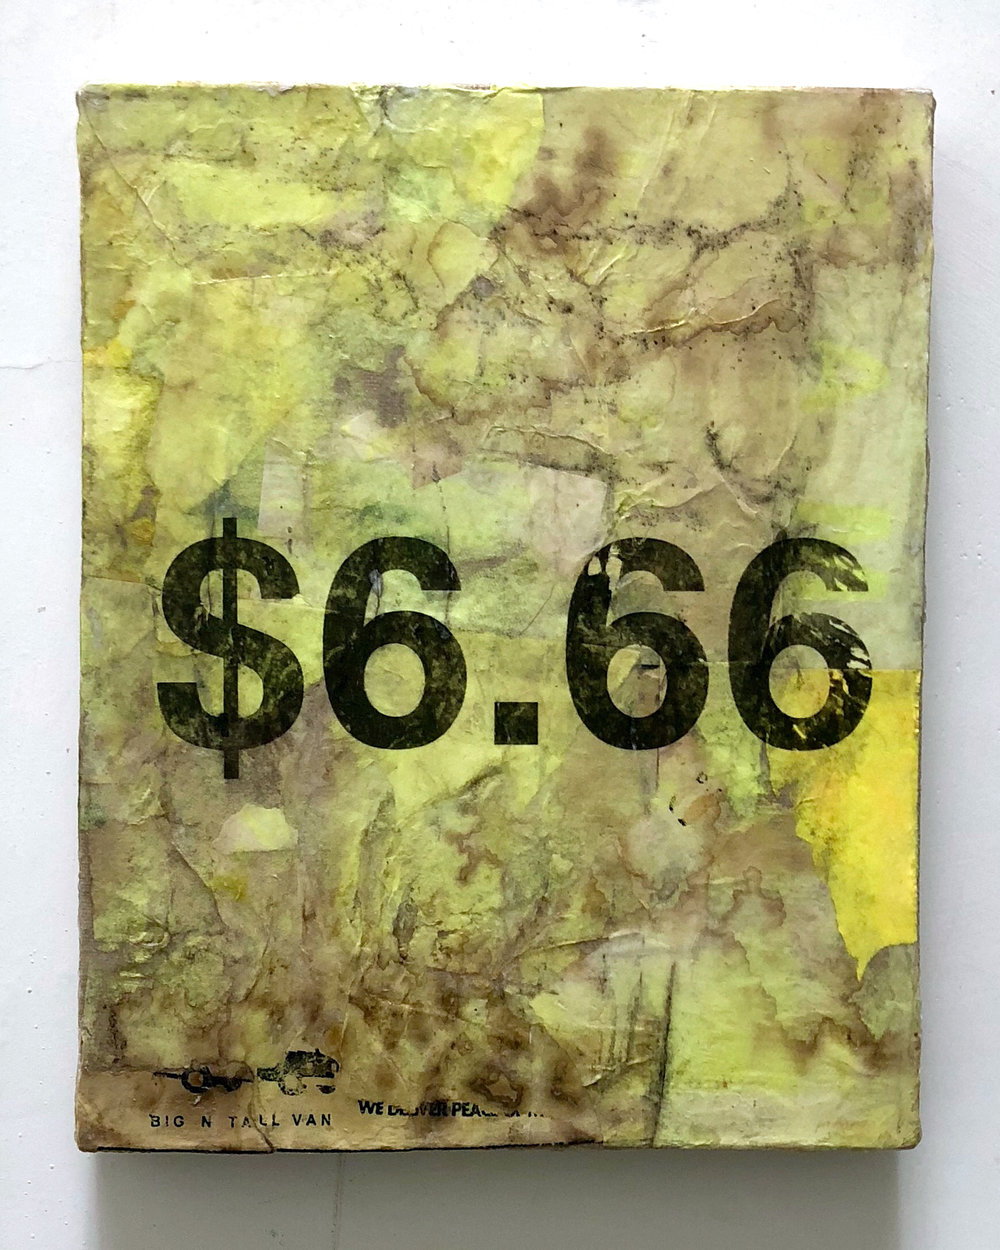 $6.66 (3)